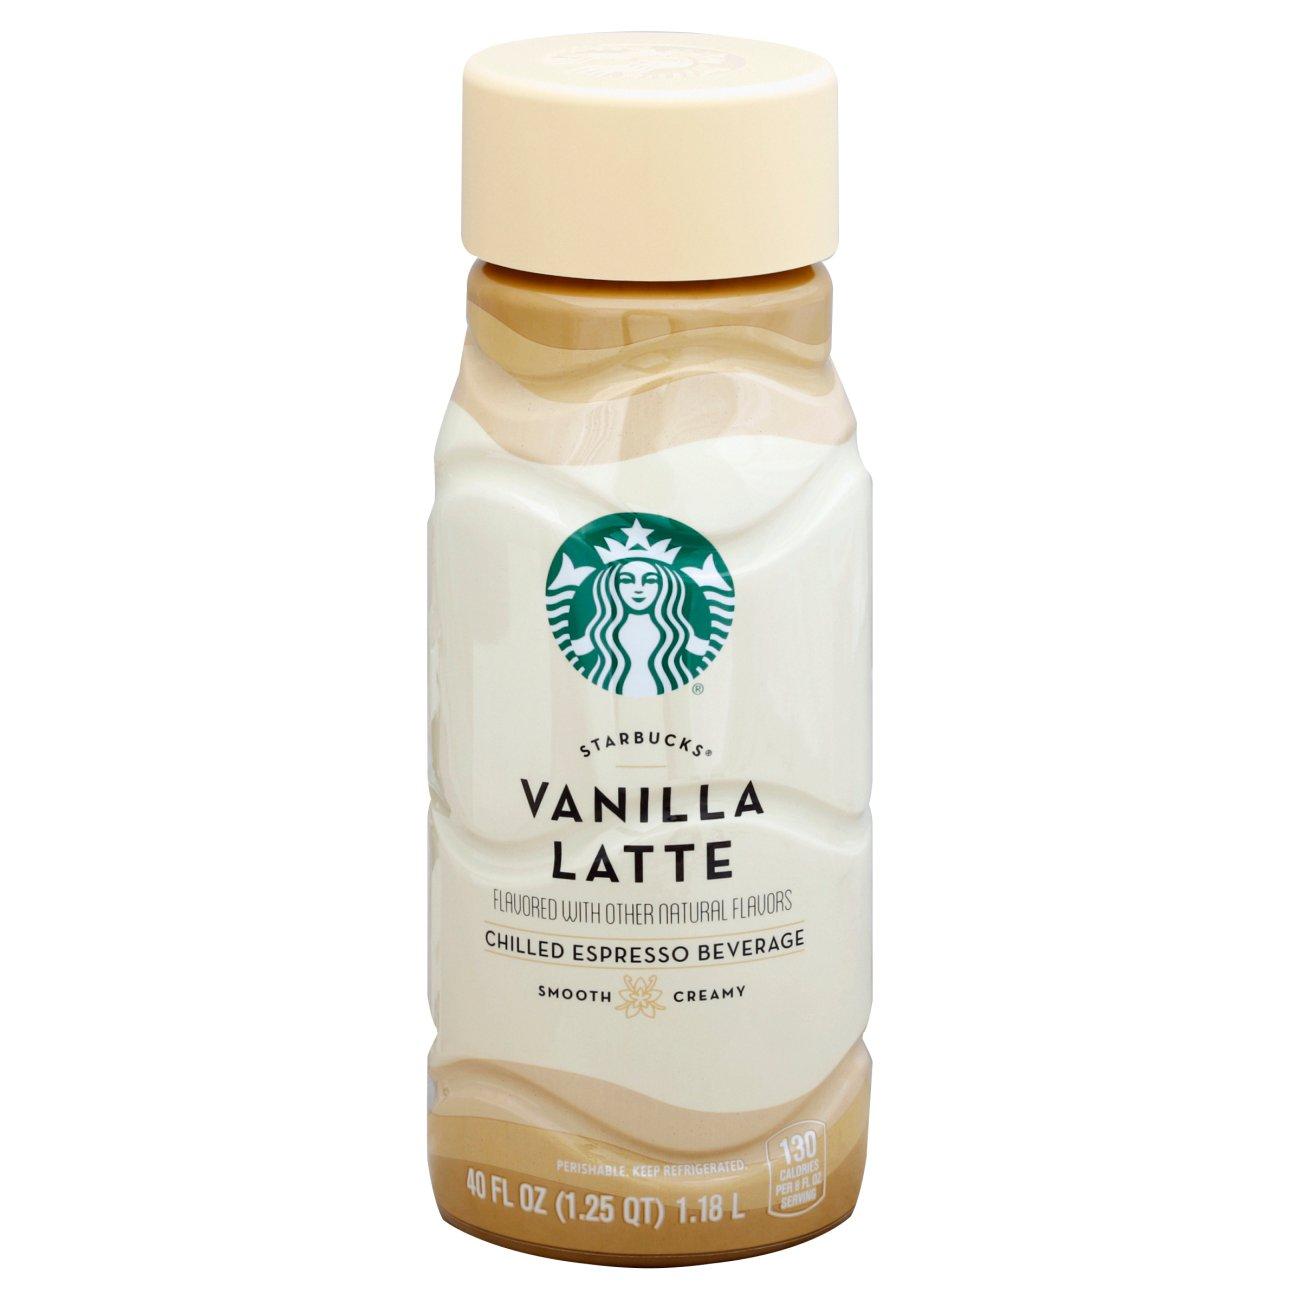 Starbucks Vanilla Latte Chilled